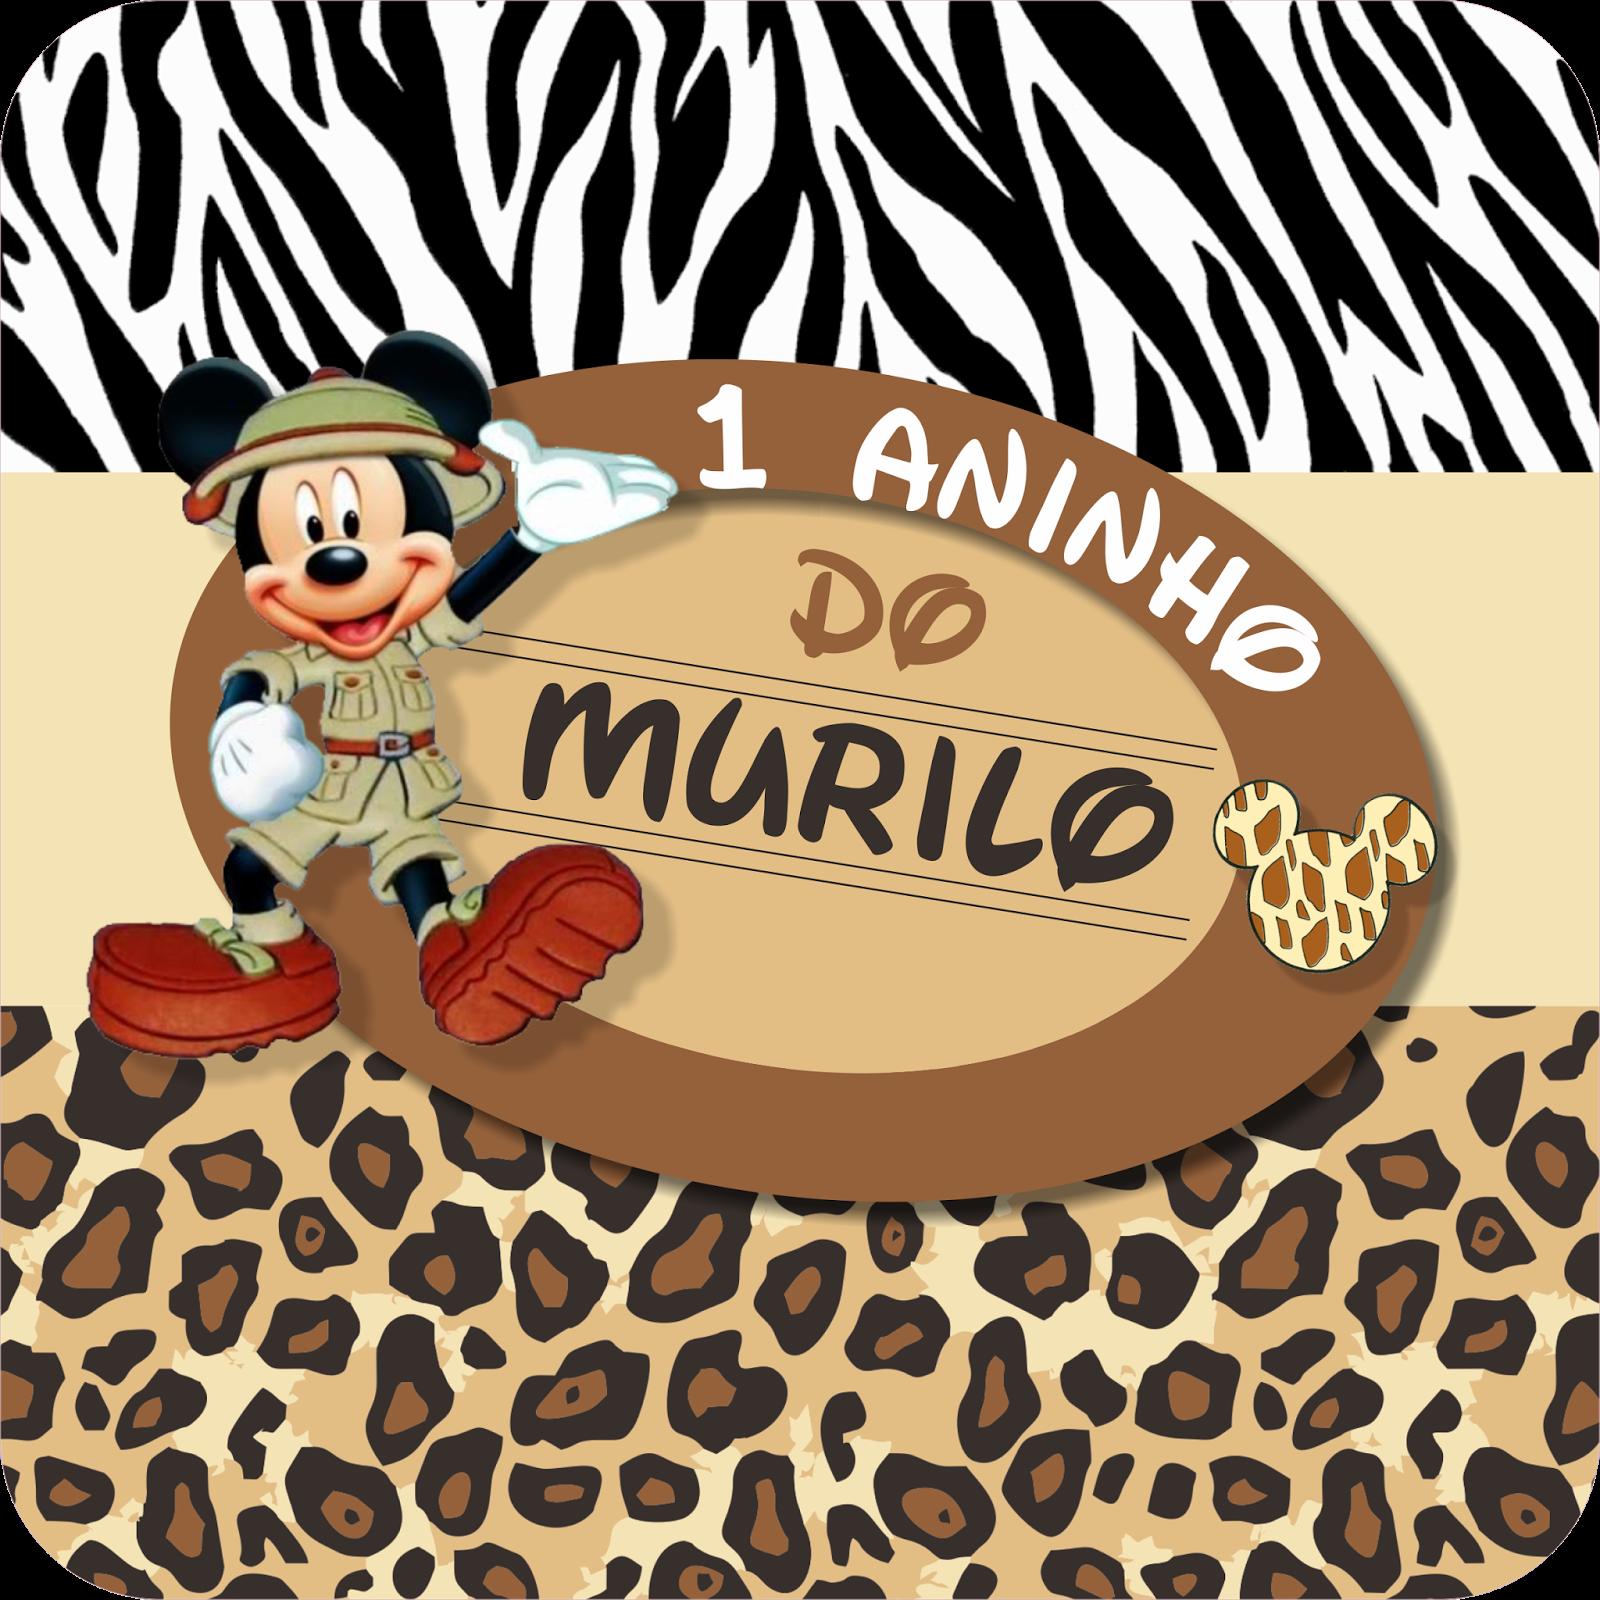 https://fruipartis.blogspot.com.br/2017/04/mickey-safari-murilo.html